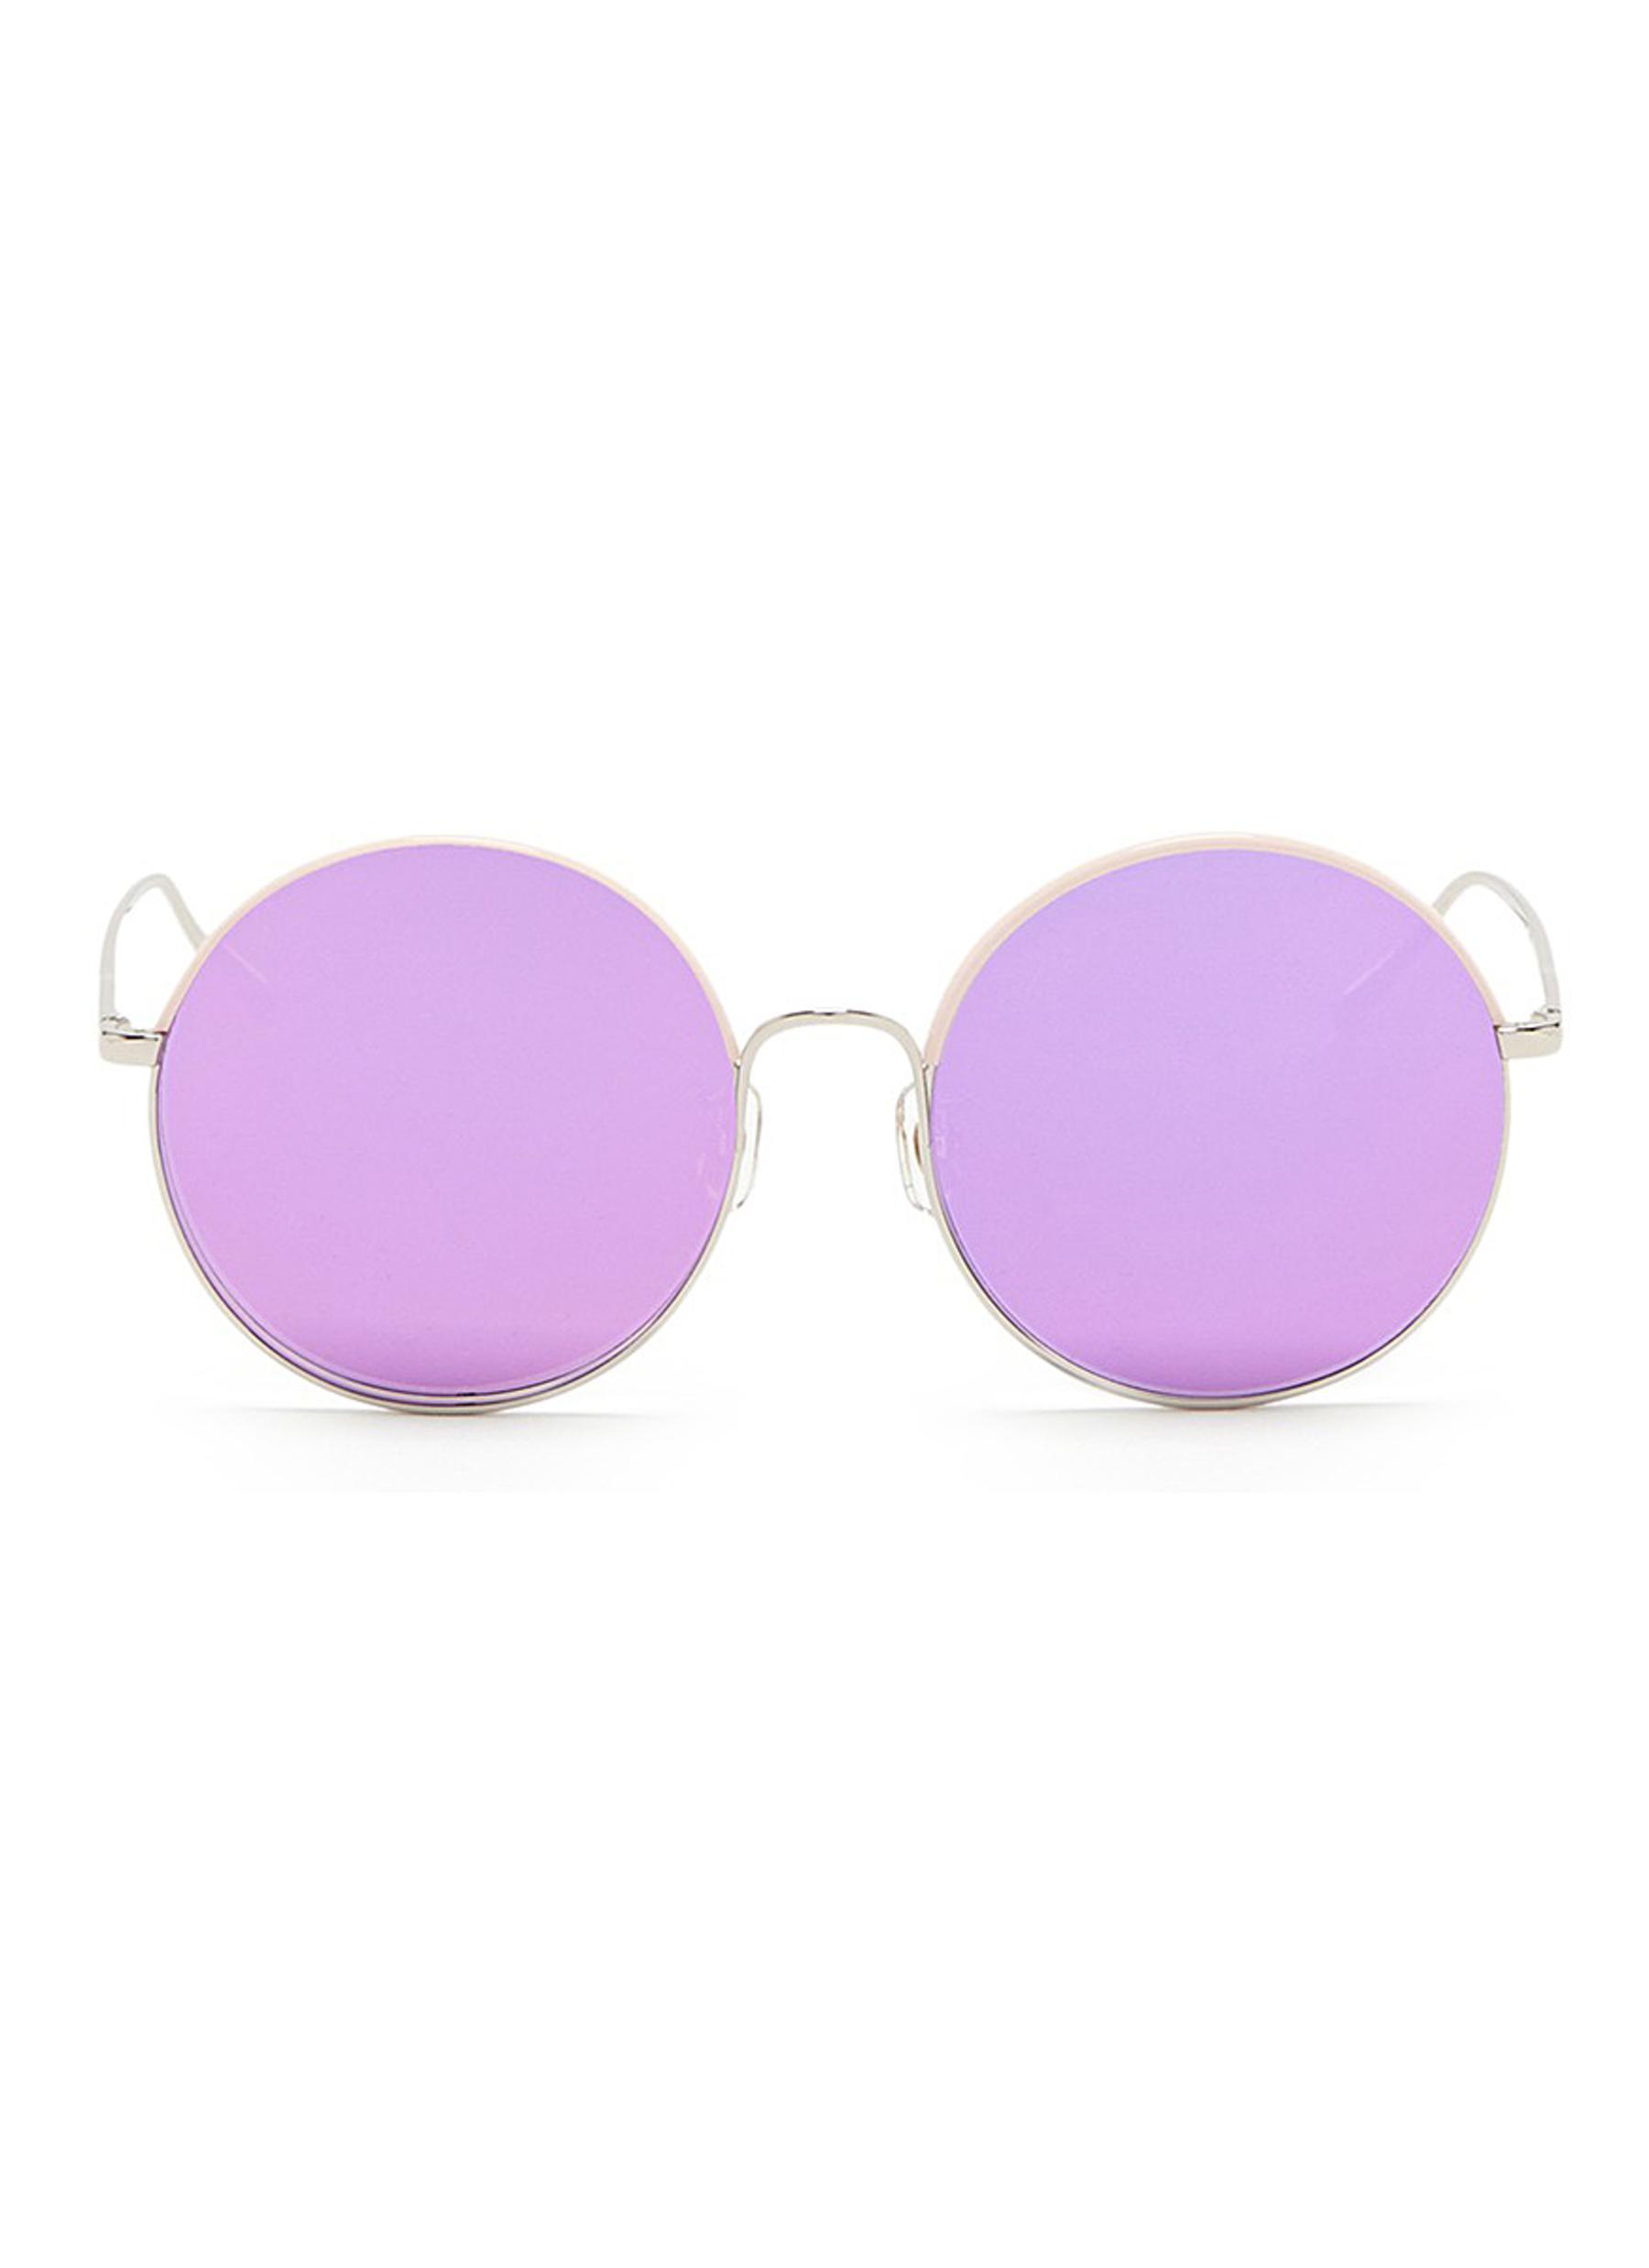 stephane christian female cantabile coated rim round metal mirror sunglasses